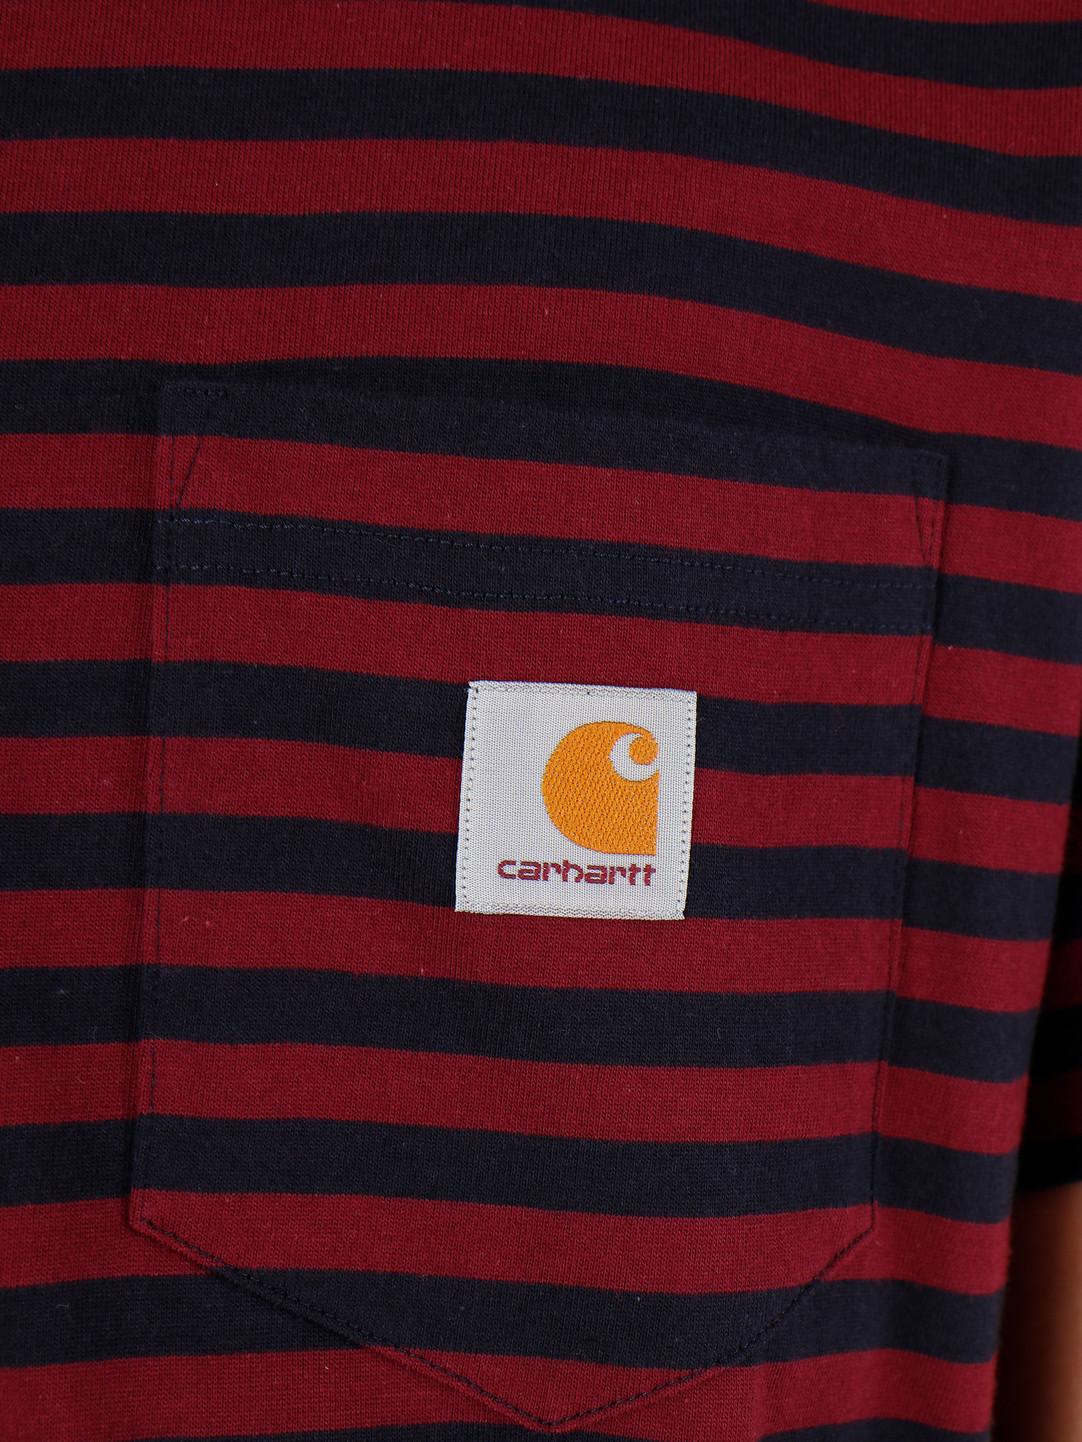 Carhartt WIP Carhartt WIP Haldon Pocket T Shirt Haldon Stripe Dark Navy Merlot I027066